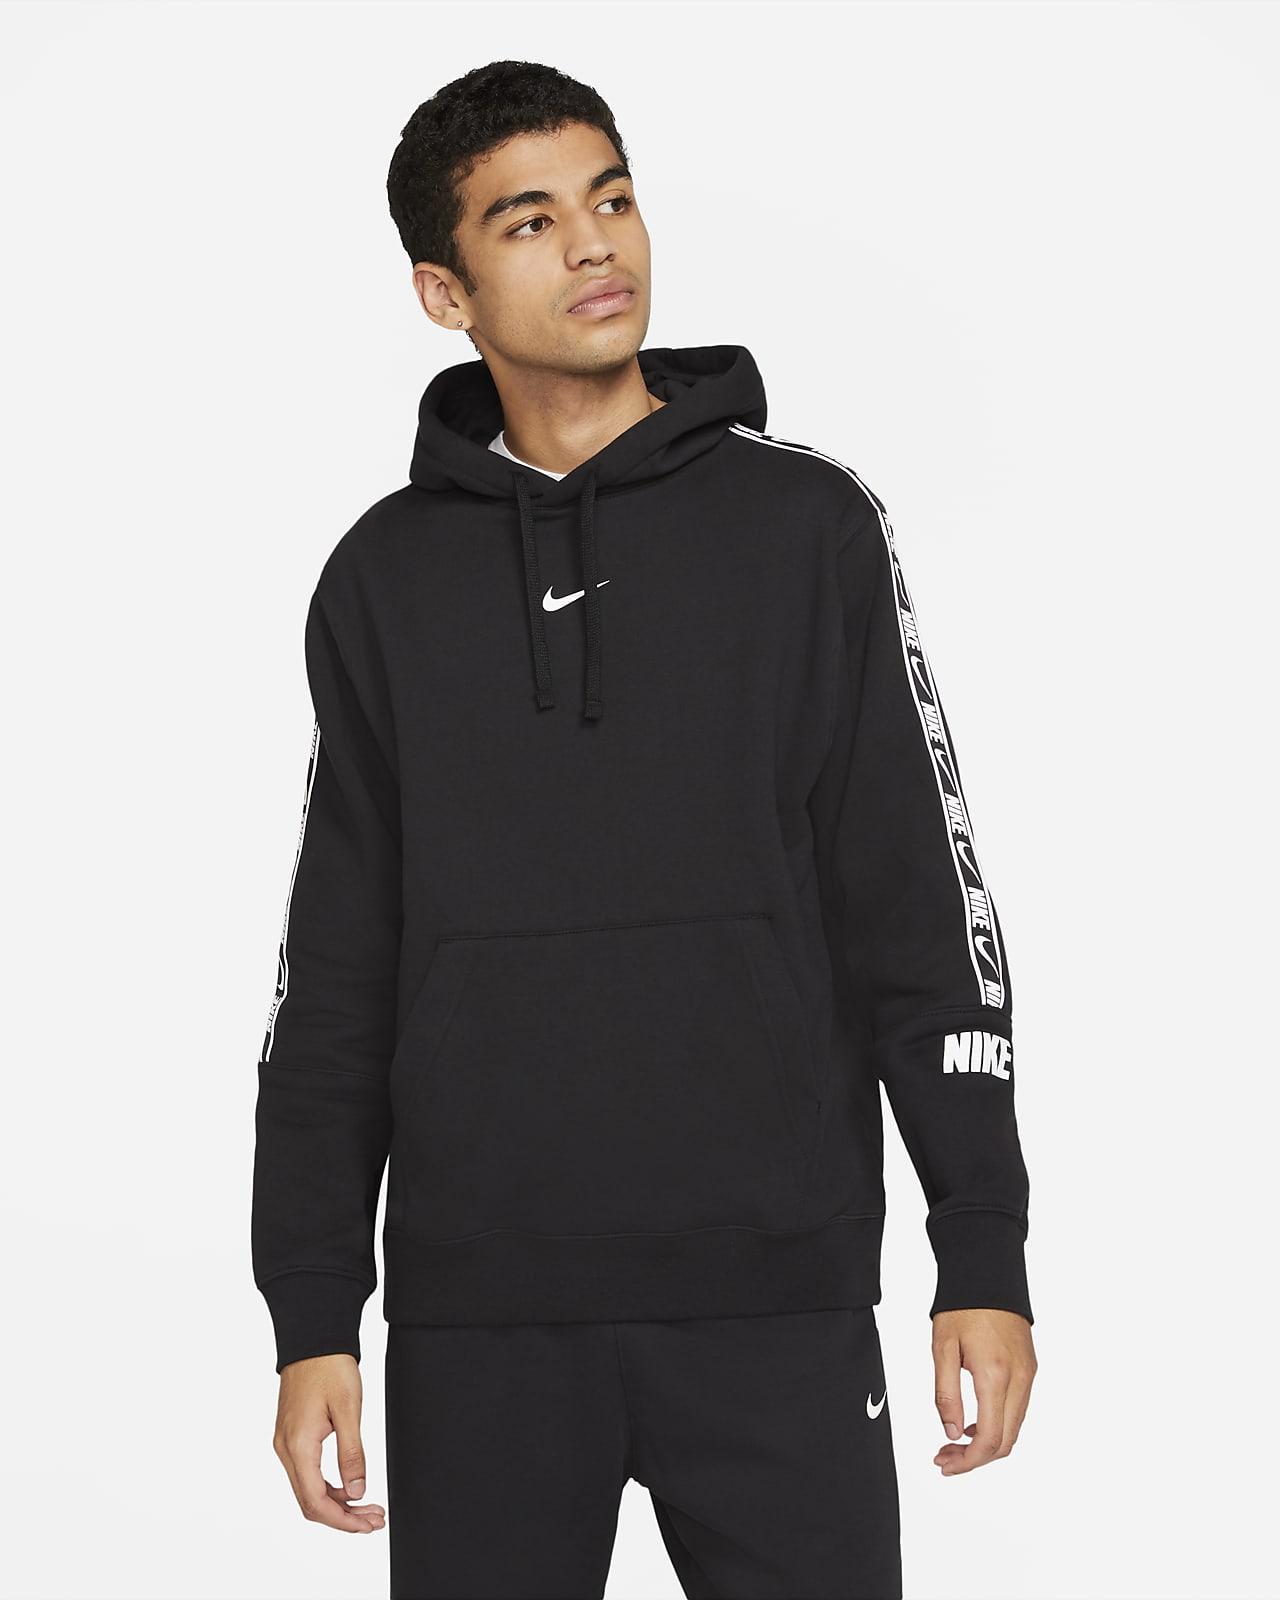 Nike Sportswear Fleece-Pullover-Hoodie für Herren